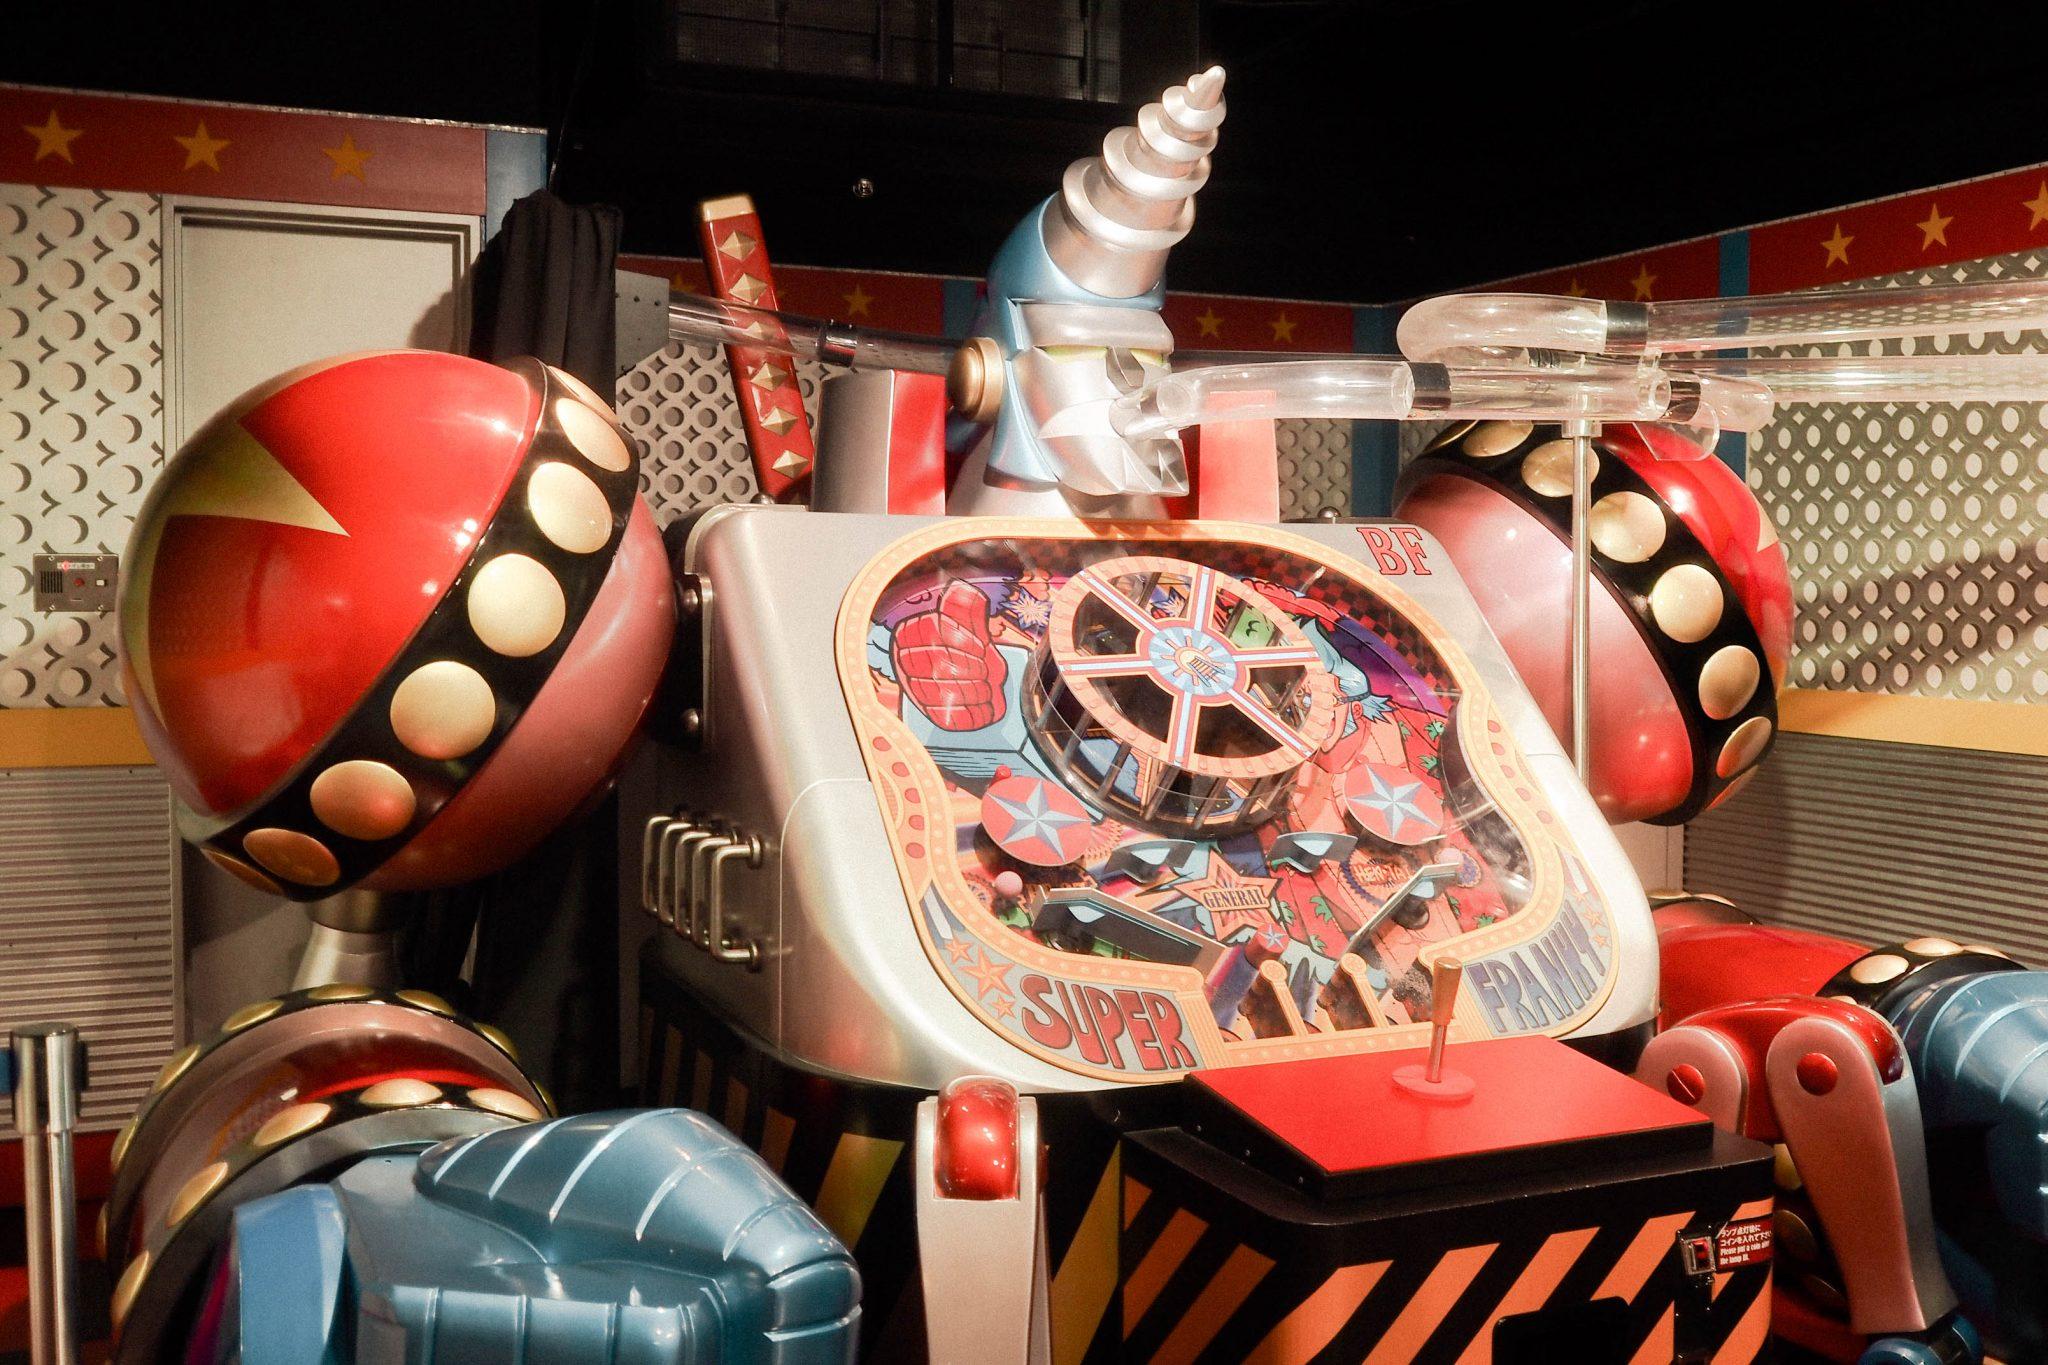 Franky's version of a pinball machine